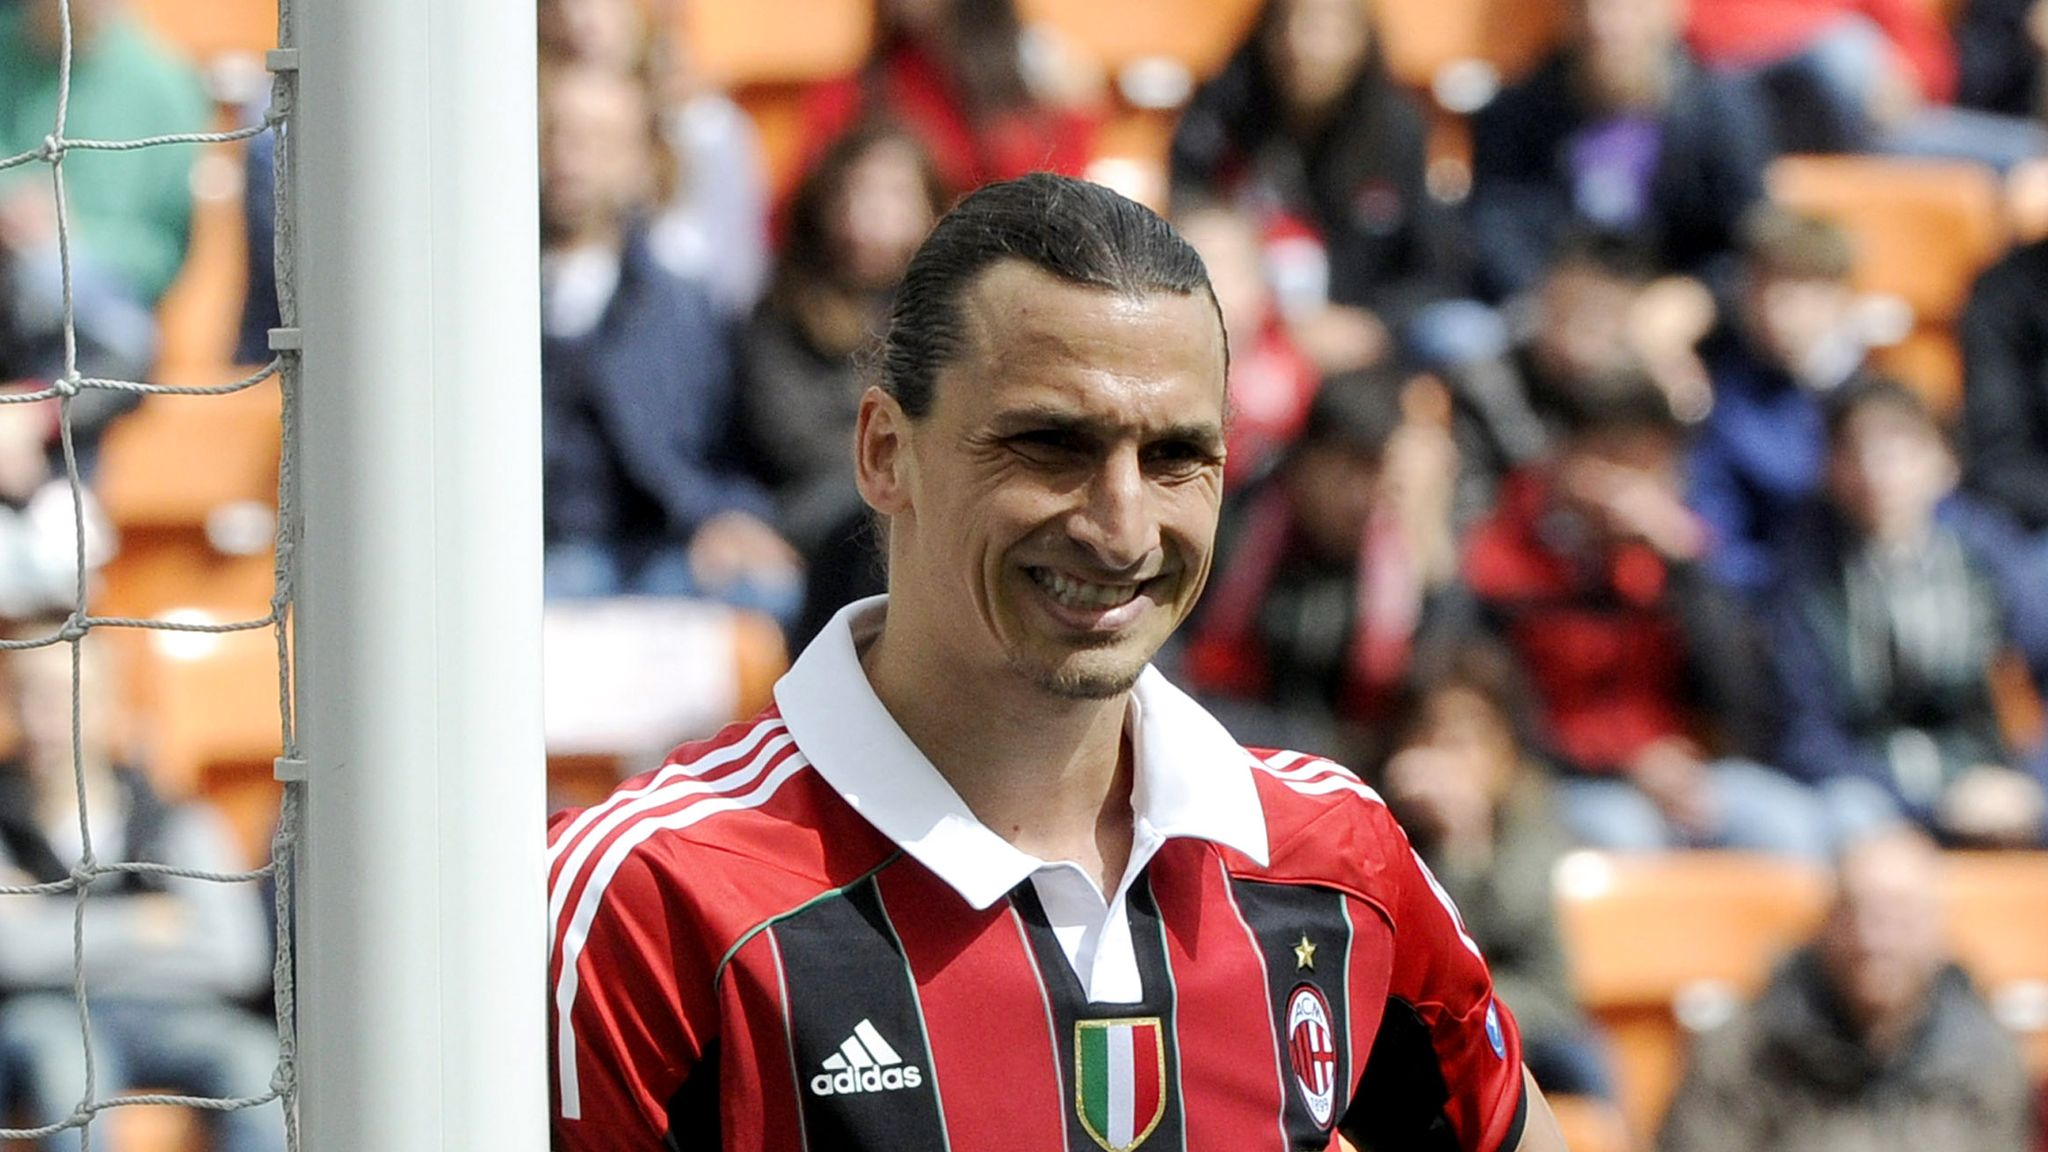 Zlatan Ibrahimovic in talks over AC Milan return